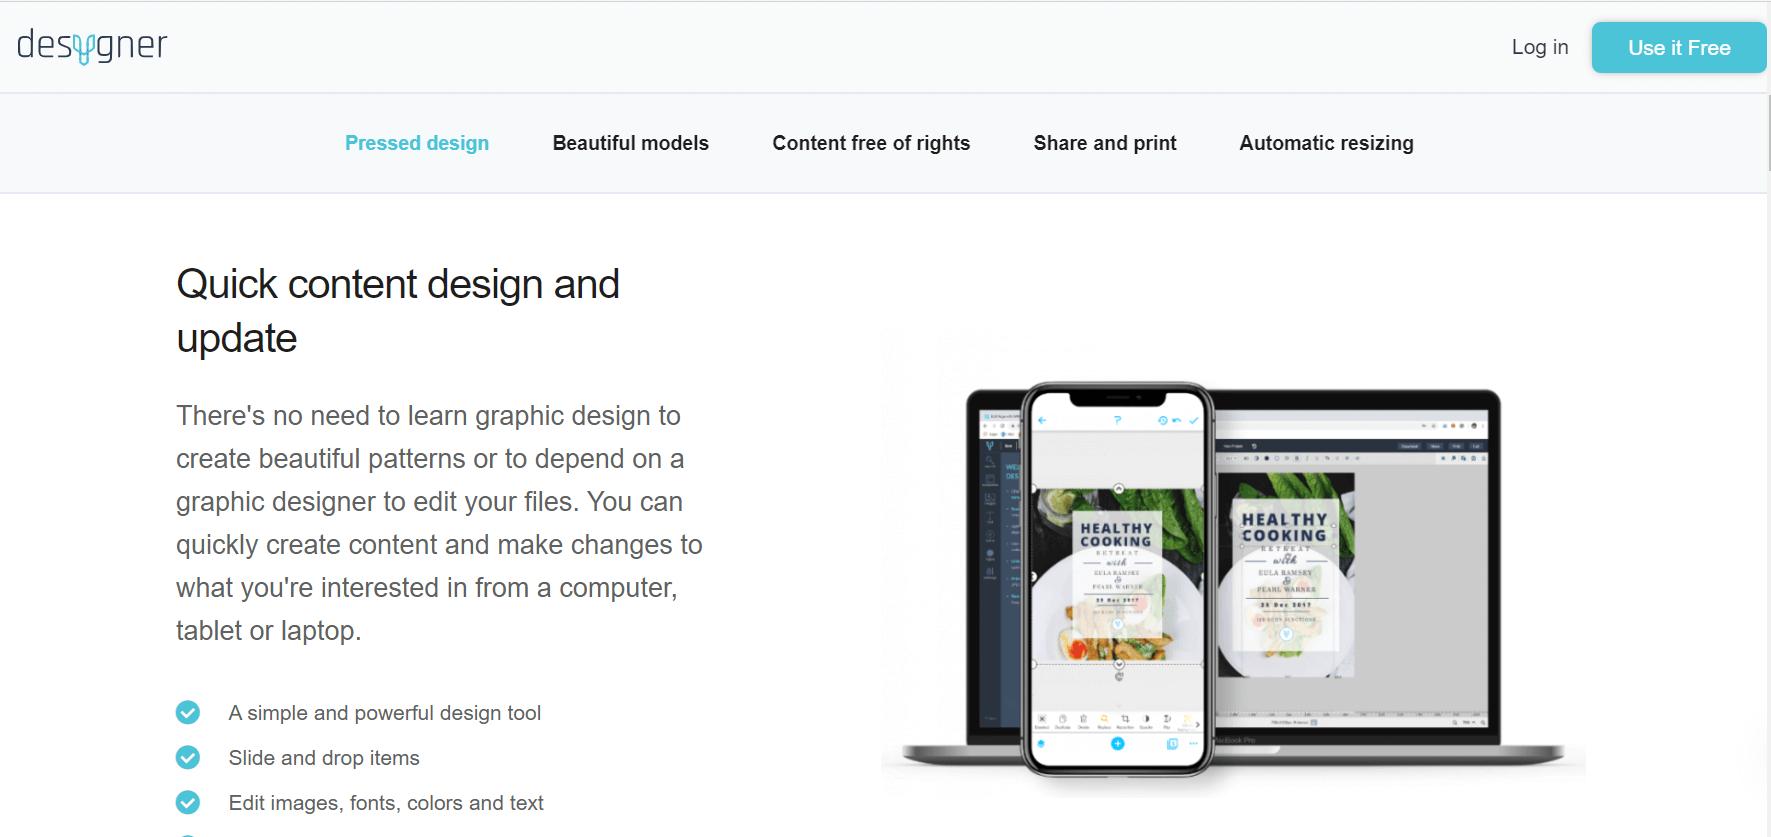 graphic-design-principles-desygner